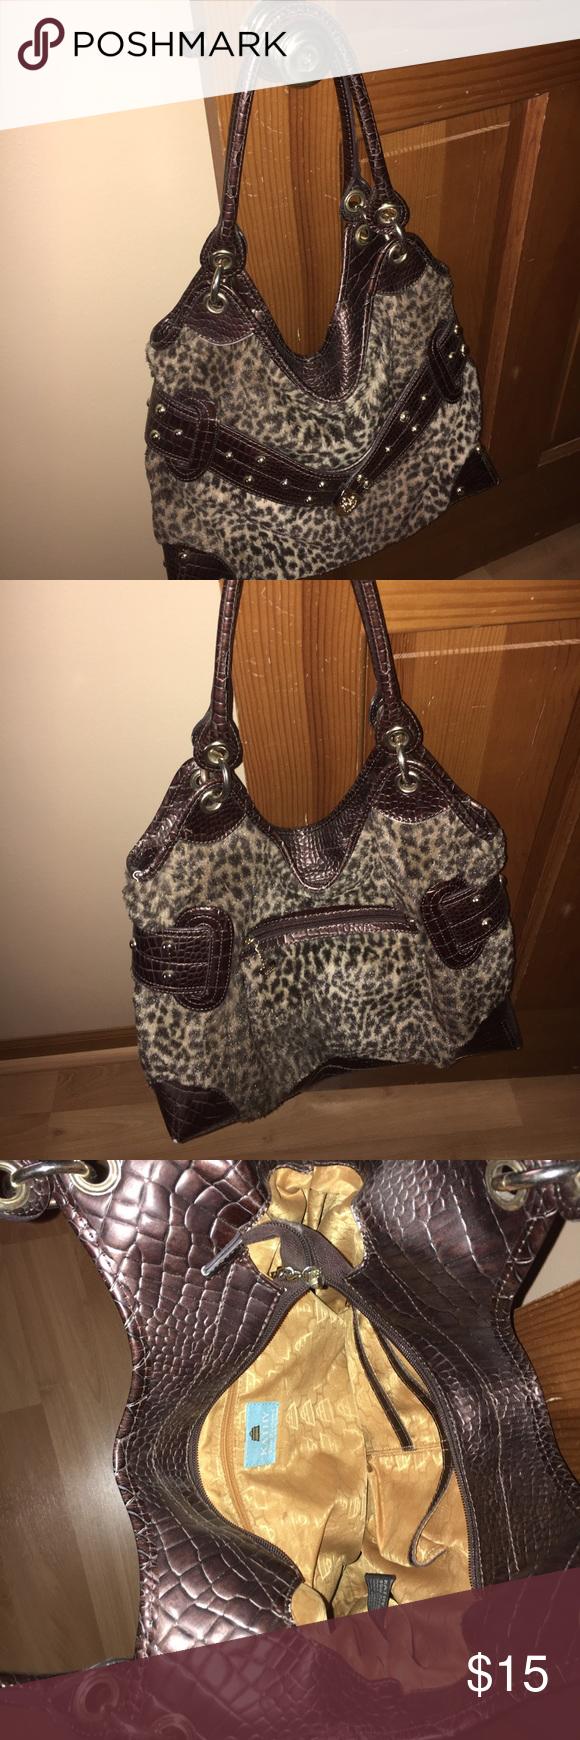 Kathy Van Zeeland cheetah purse Medium-sized Kathy Van Zeeland cheetah purse. Minimal wear and tear. Zips. Gold hardware. Kathy Van Zeeland Bags Shoulder Bags